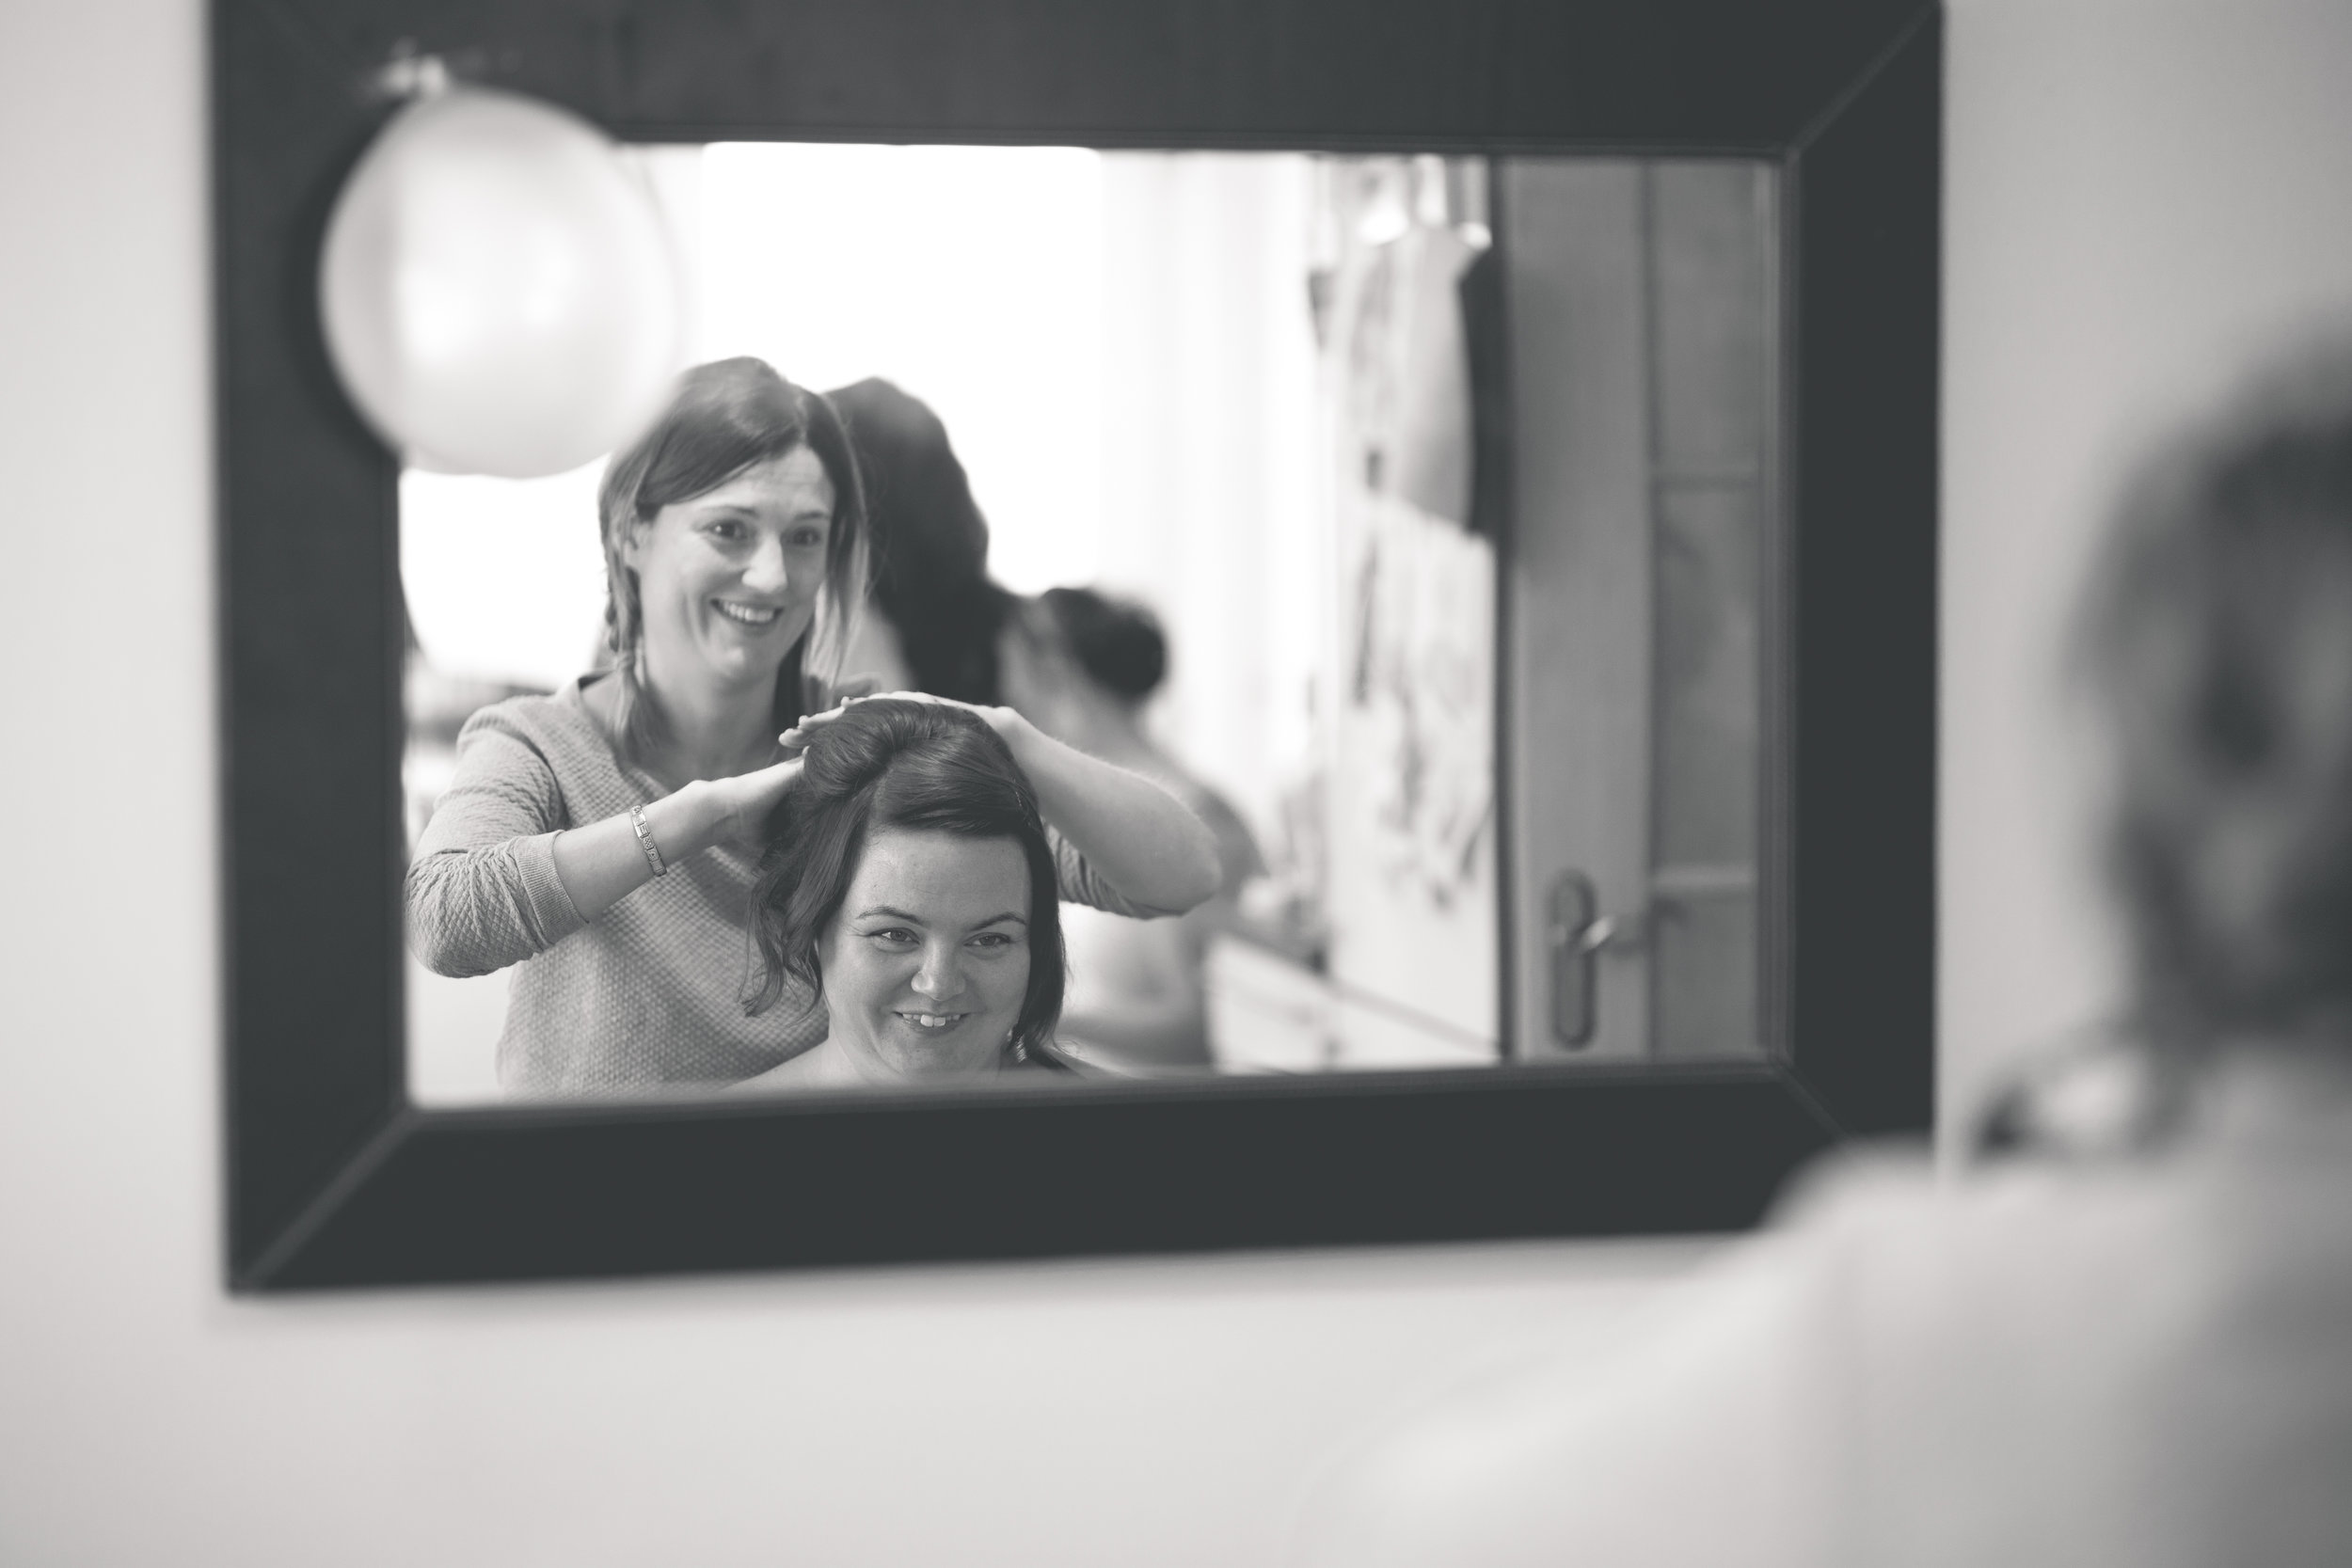 Antoinette & Stephen - Bridal Preparations | Brian McEwan Photography | Wedding Photographer Northern Ireland 95.jpg